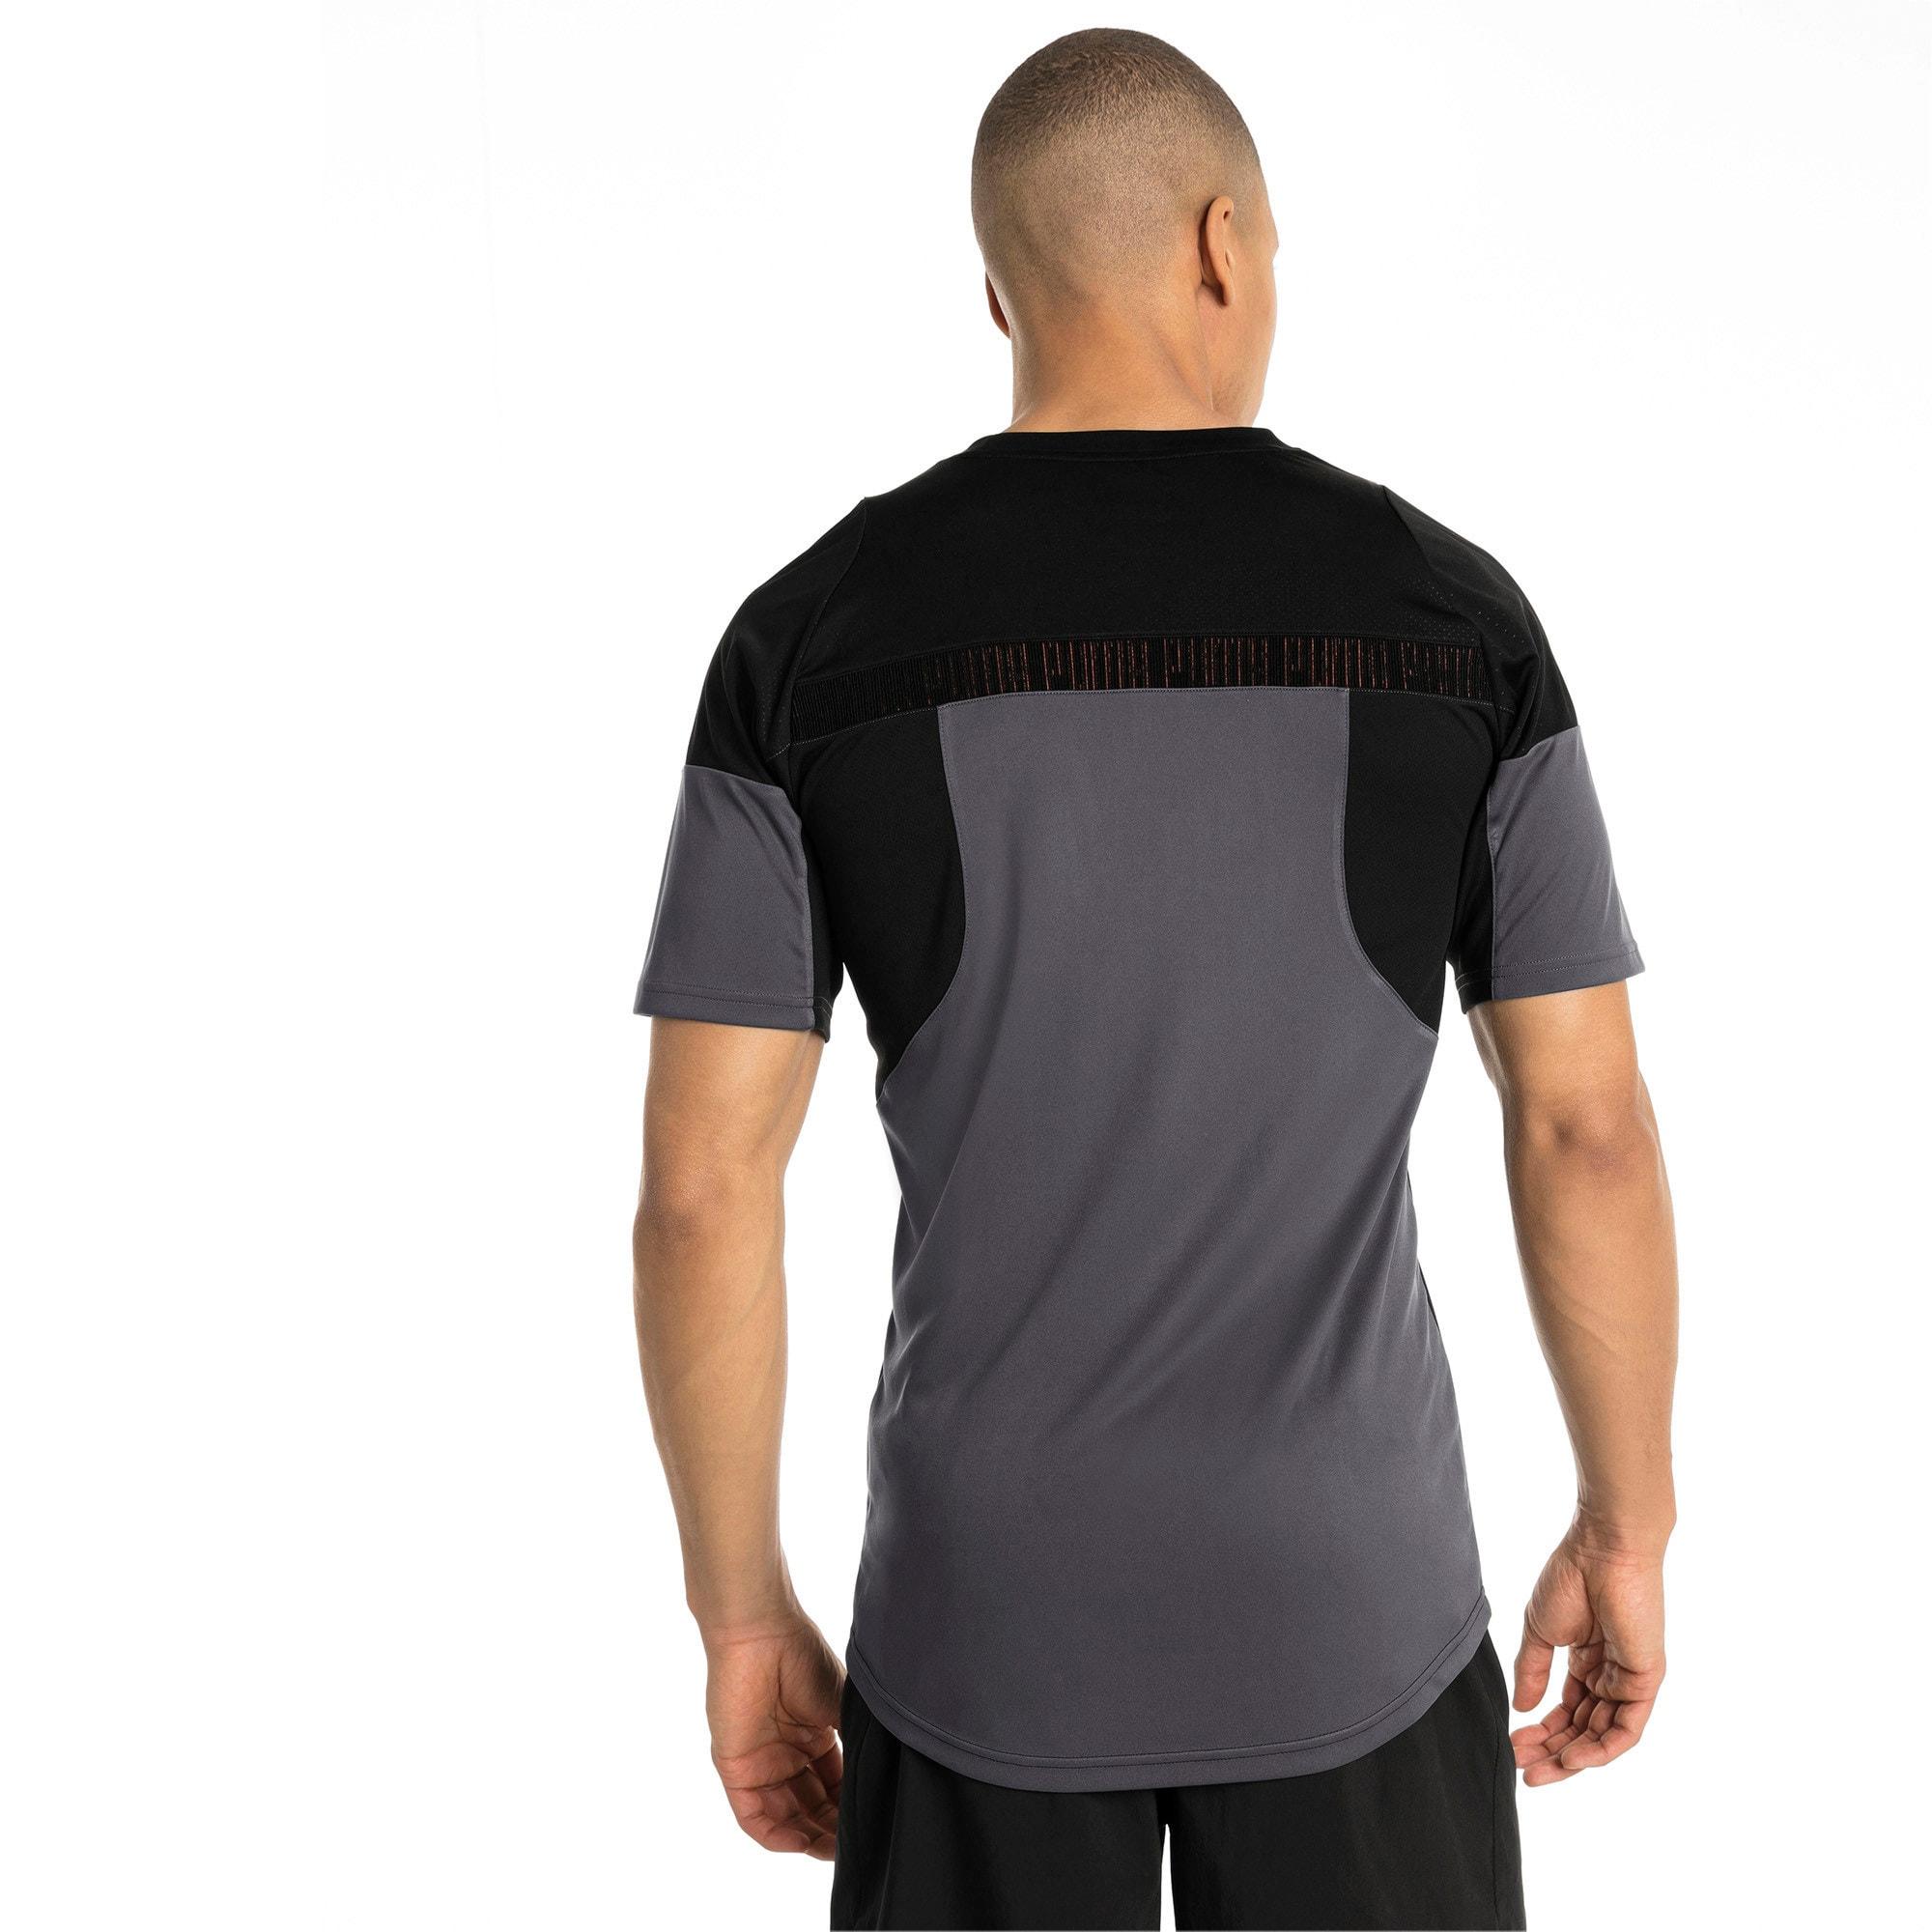 Thumbnail 3 of ftblNXT Graphic Men's Training Top, Puma Black-Iron Gate, medium